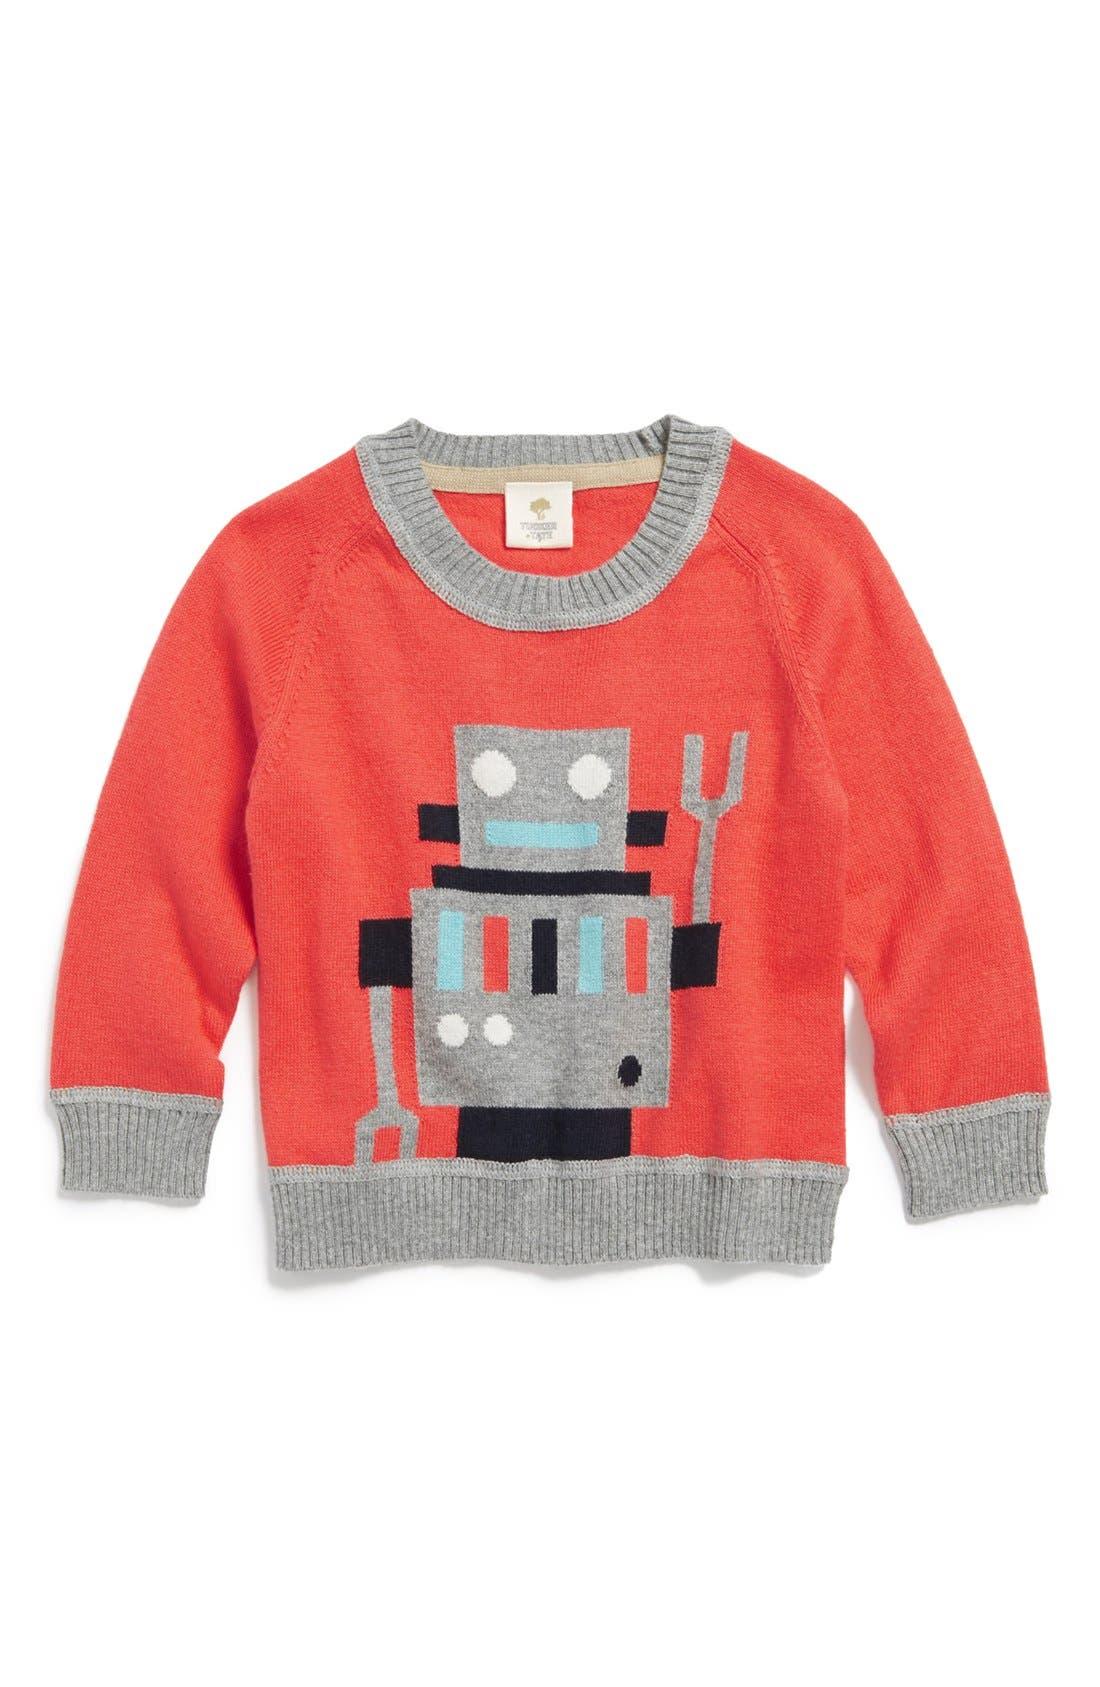 Main Image - Tucker + Tate Knit Cotton & Cashmere Crewneck Sweater (Baby Boys)